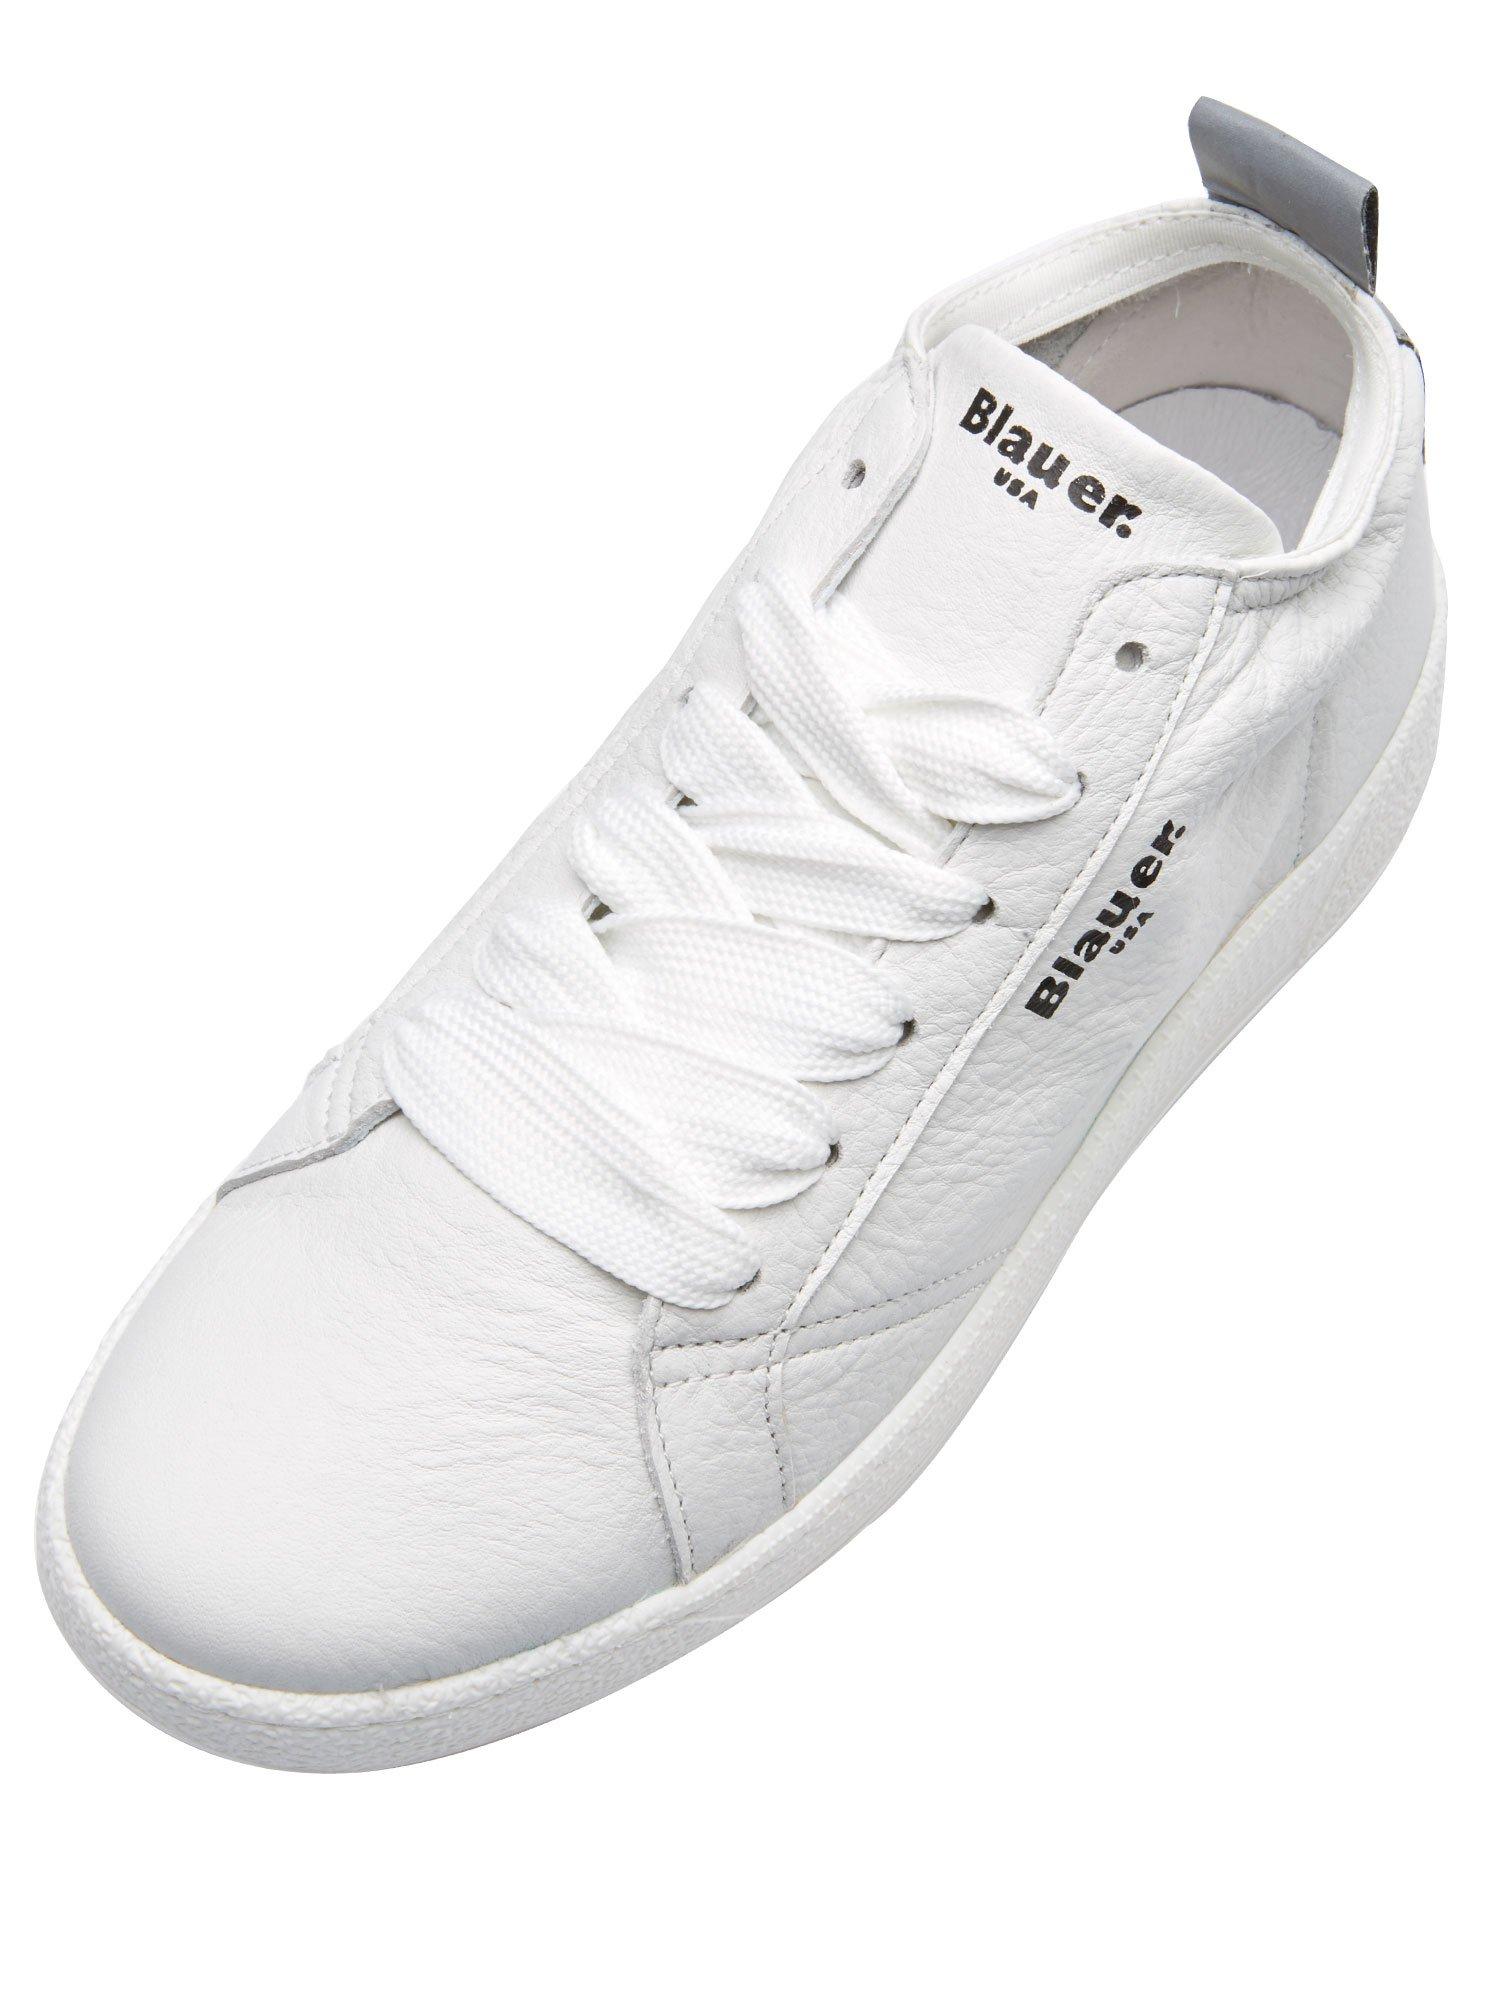 Blauer - OLYMPIA LEA Sneakers alte - Bianco - Blauer